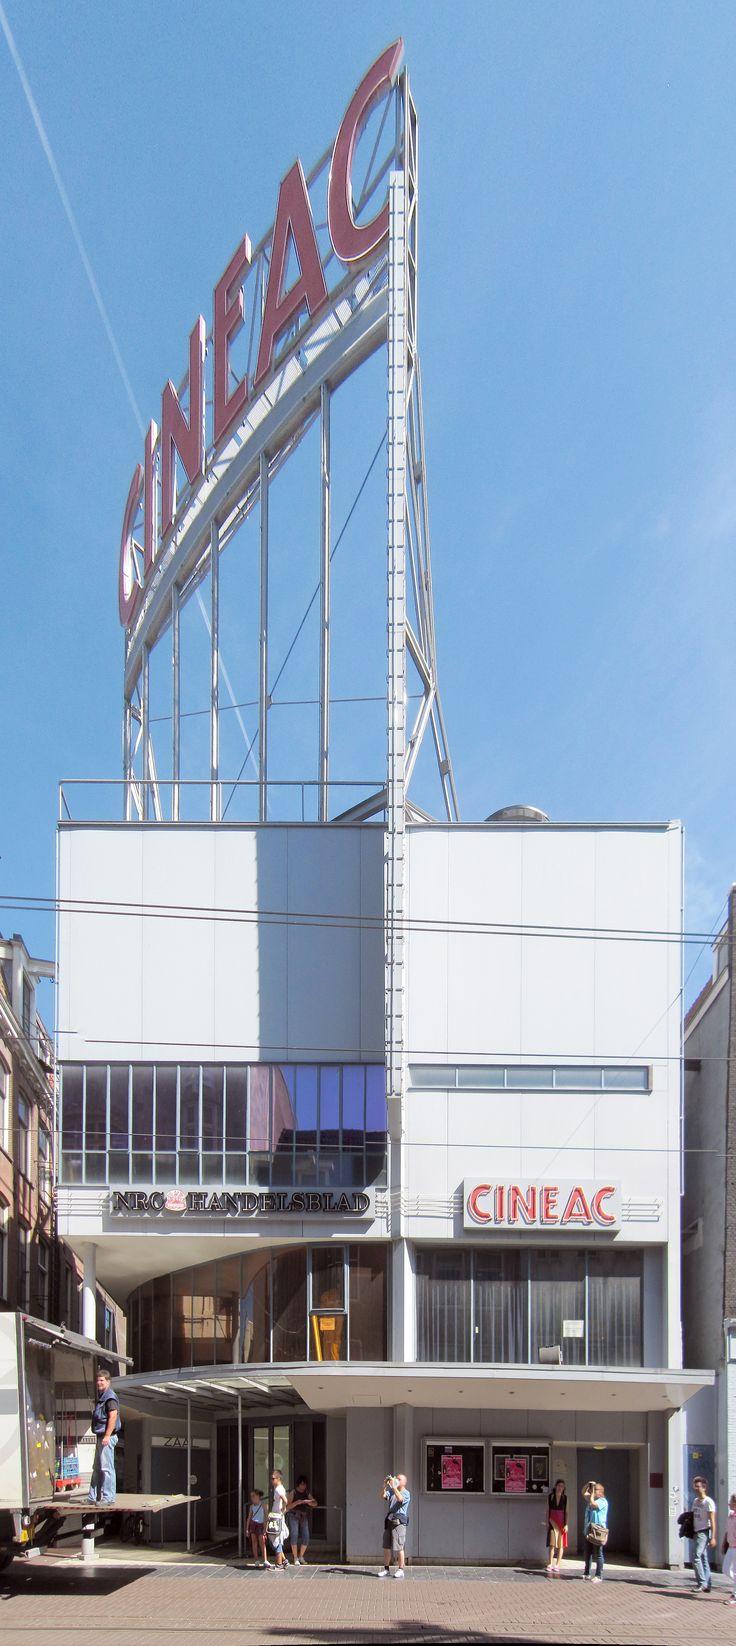 Movietheatre Cineac, Amsterdam, the Netherlands. 1934. Architect J. Duiker